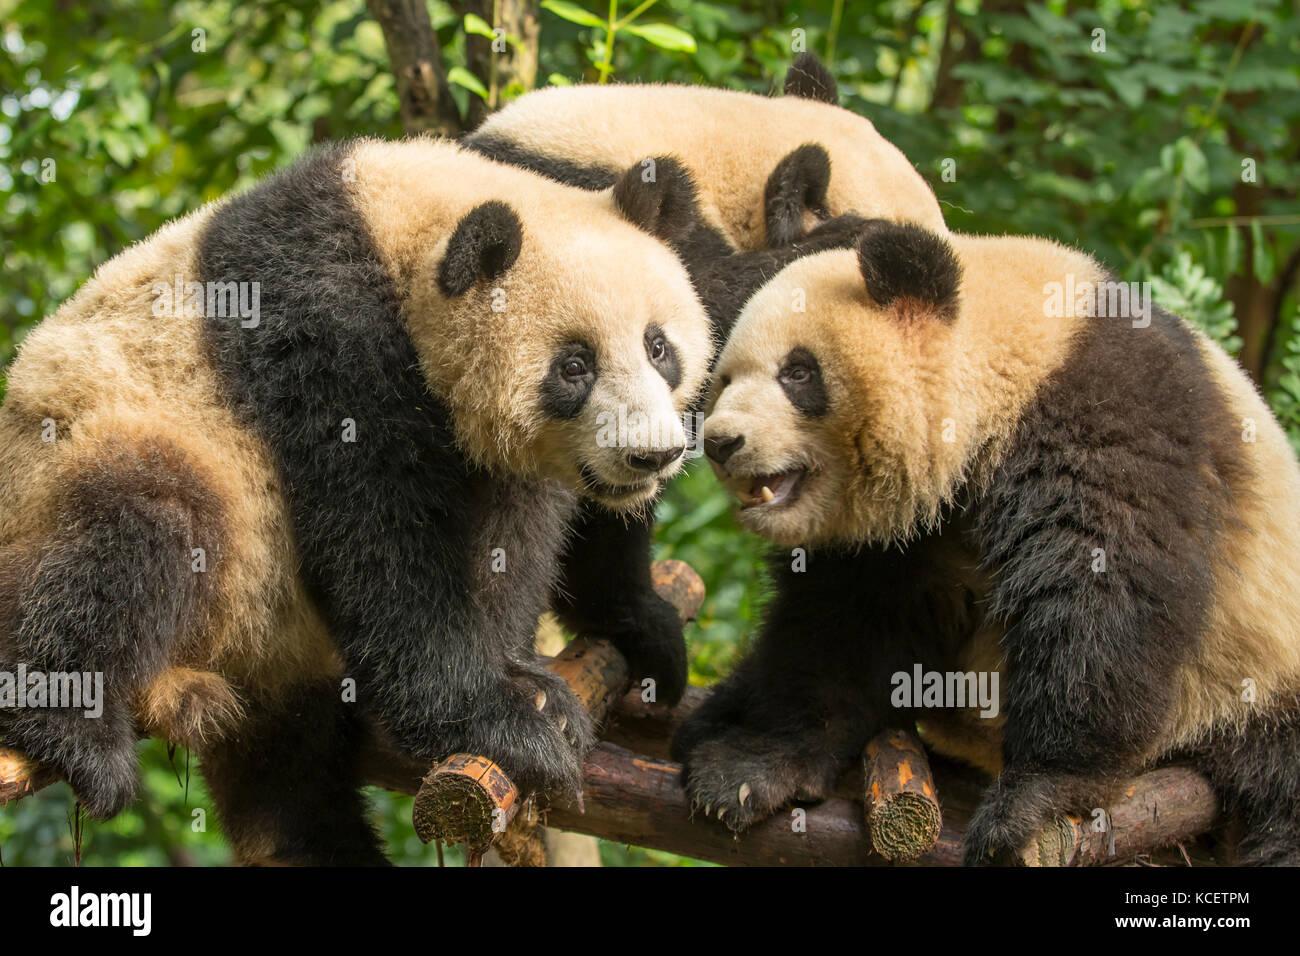 Giant Pandas, Ailuropoda melanoleuca, at Panda Research Base, Chengdu, Sichuan, China - Stock Image